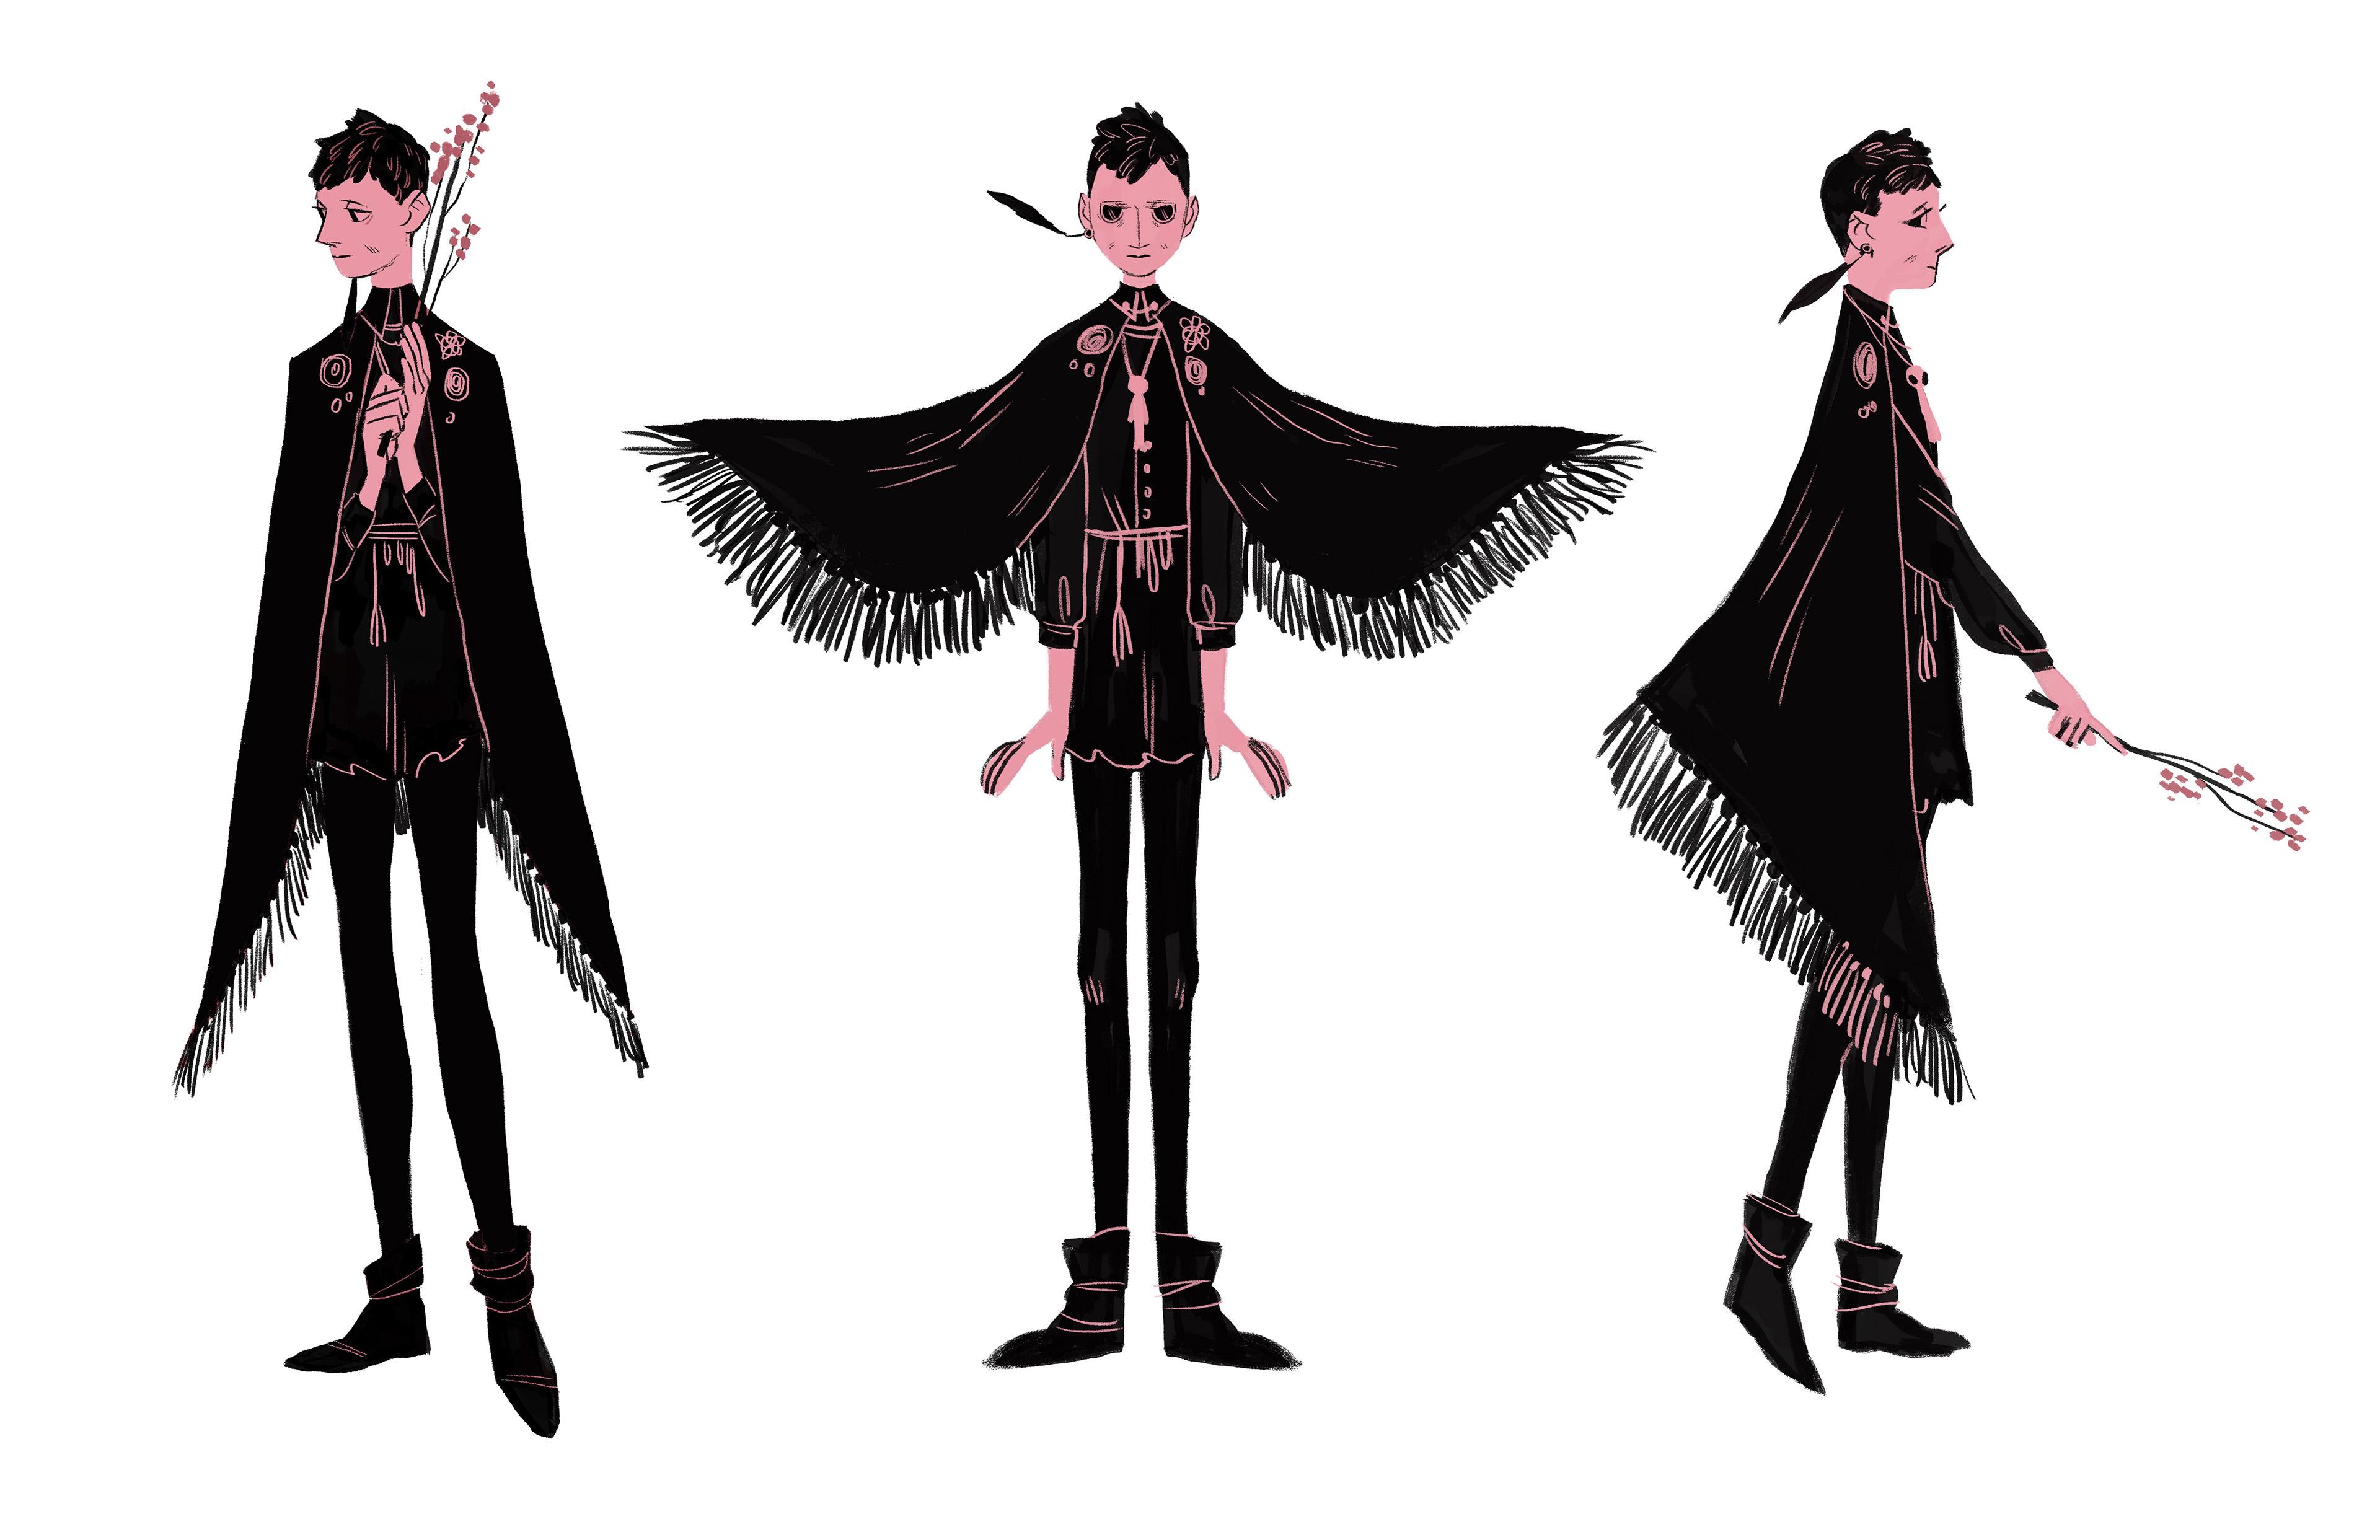 Character Design Inspiration Tumblr : Aesthetic inspiration